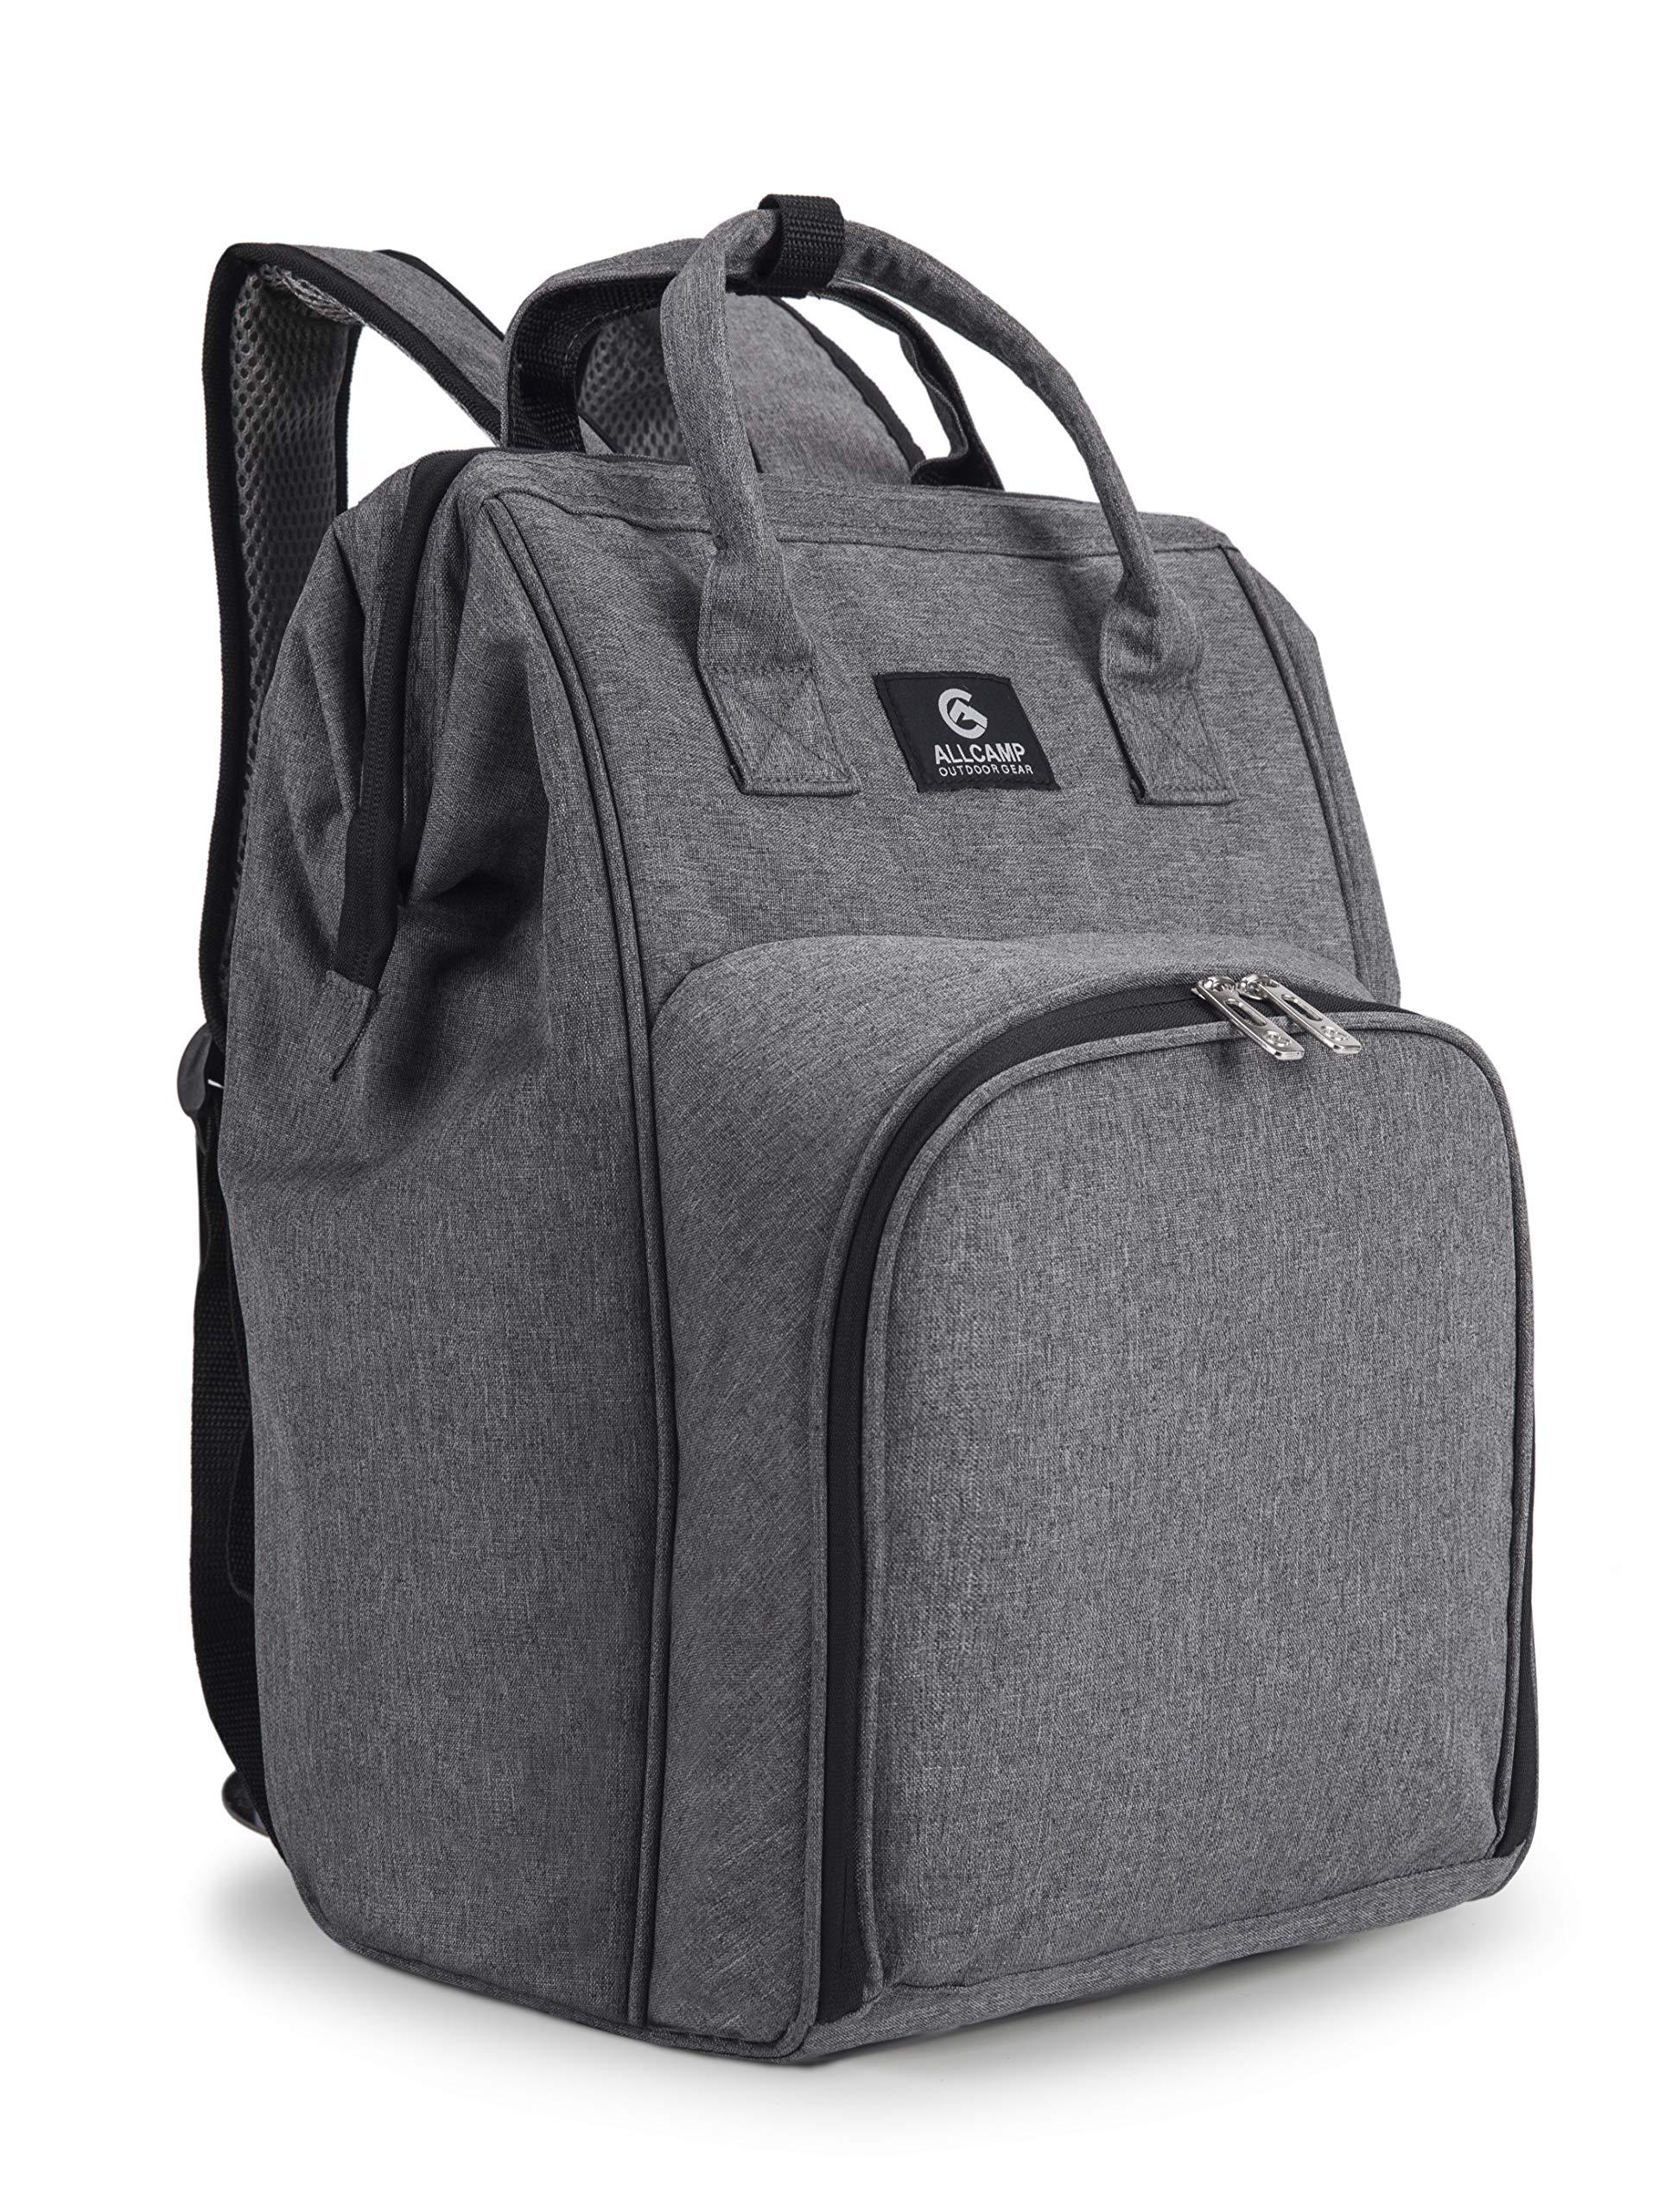 ALLCAMP Backpack Detachable Blanket Cutlery